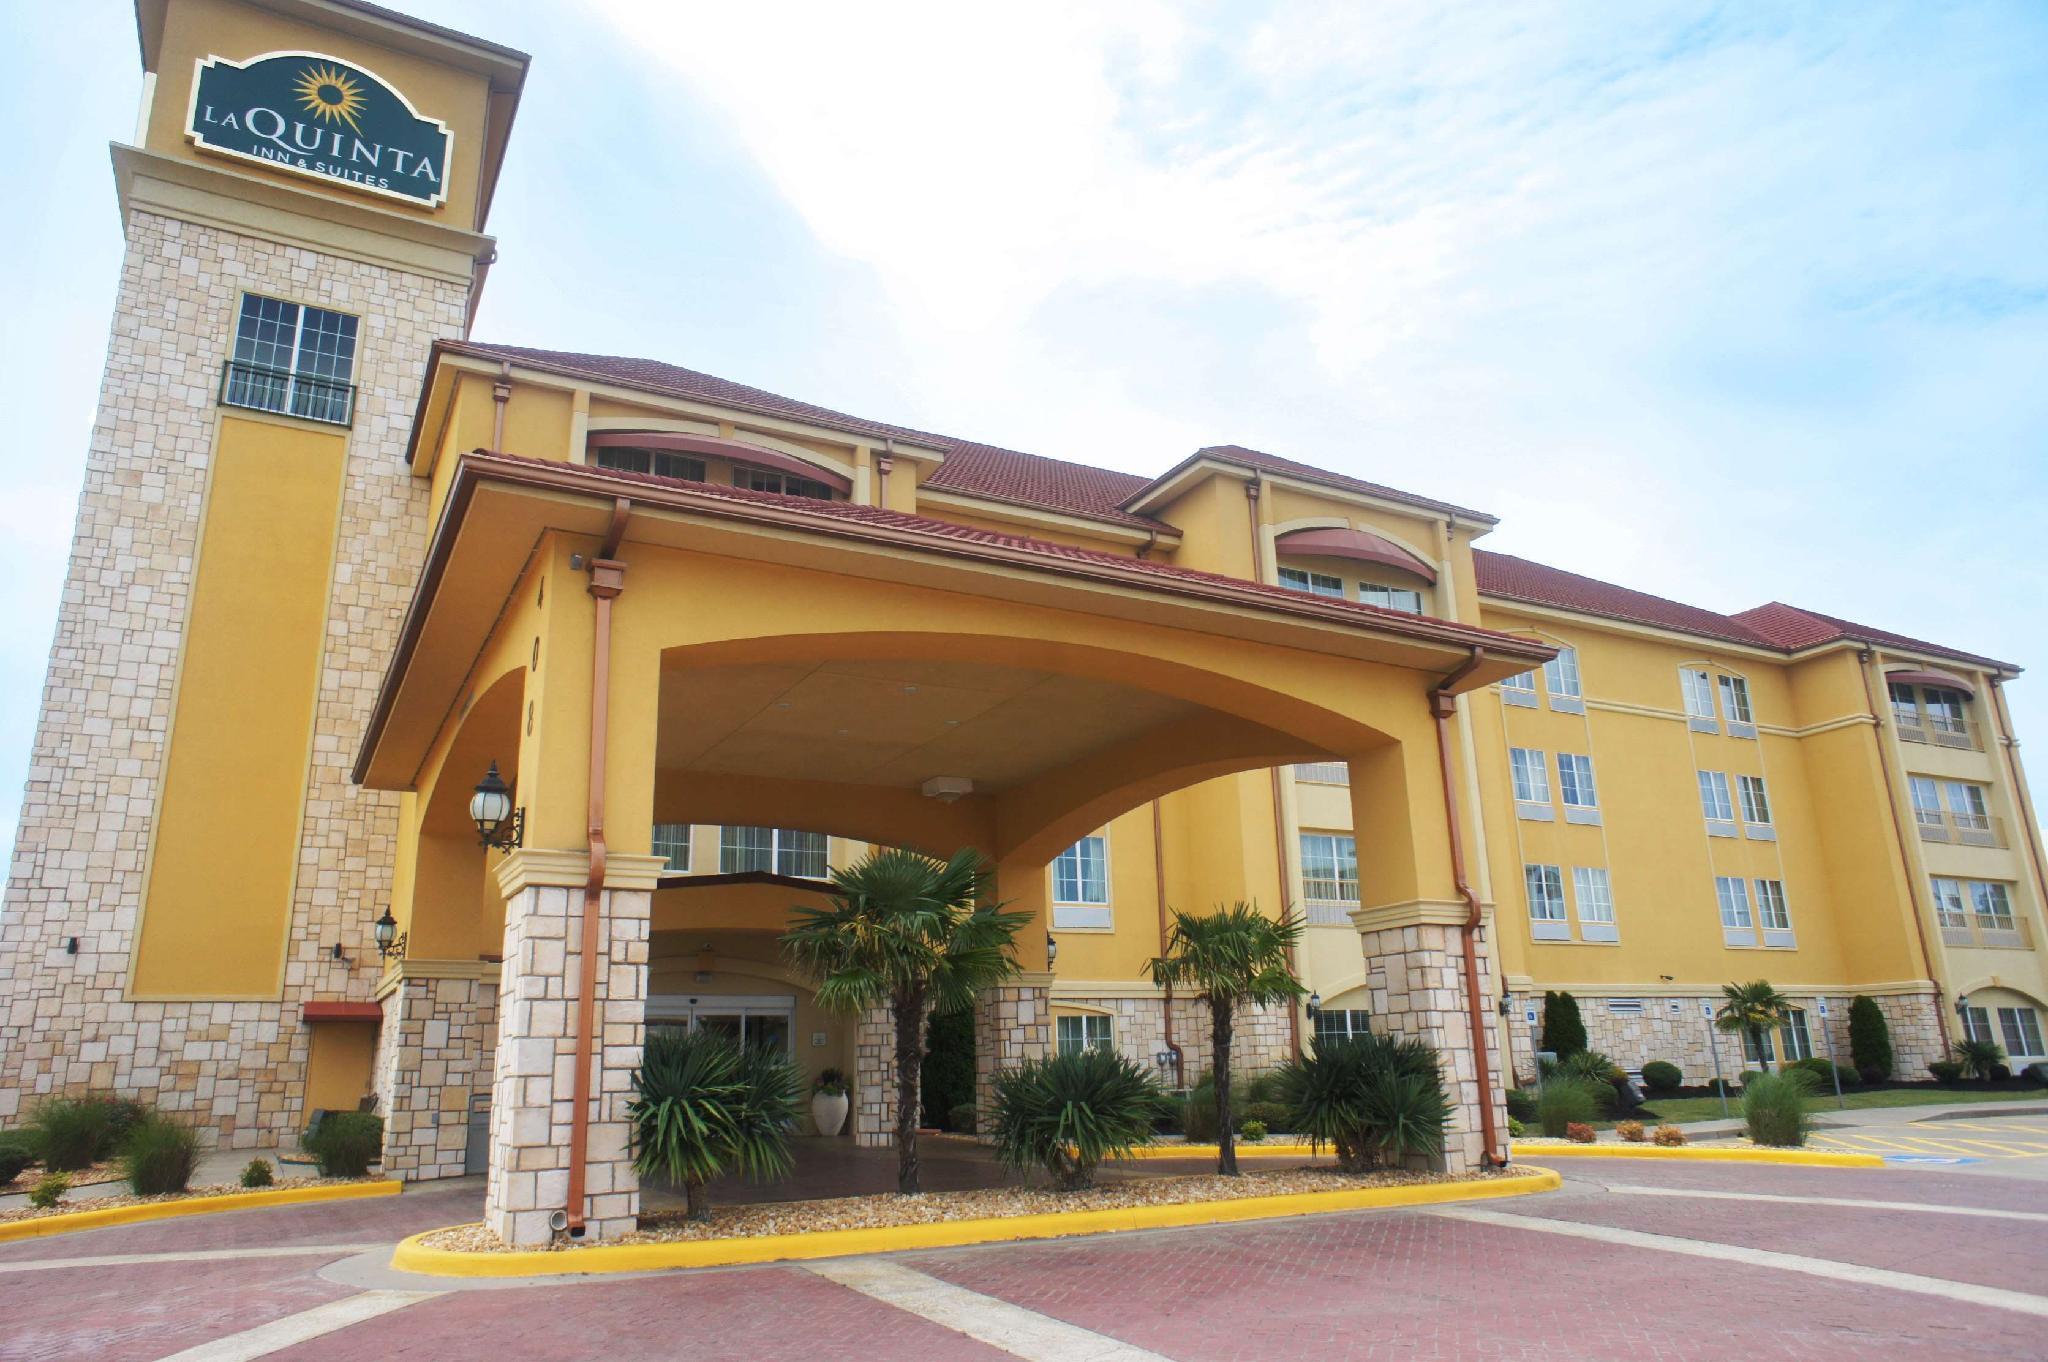 La Quinta Inn And Suites By Wyndham Little Rock   Bryant